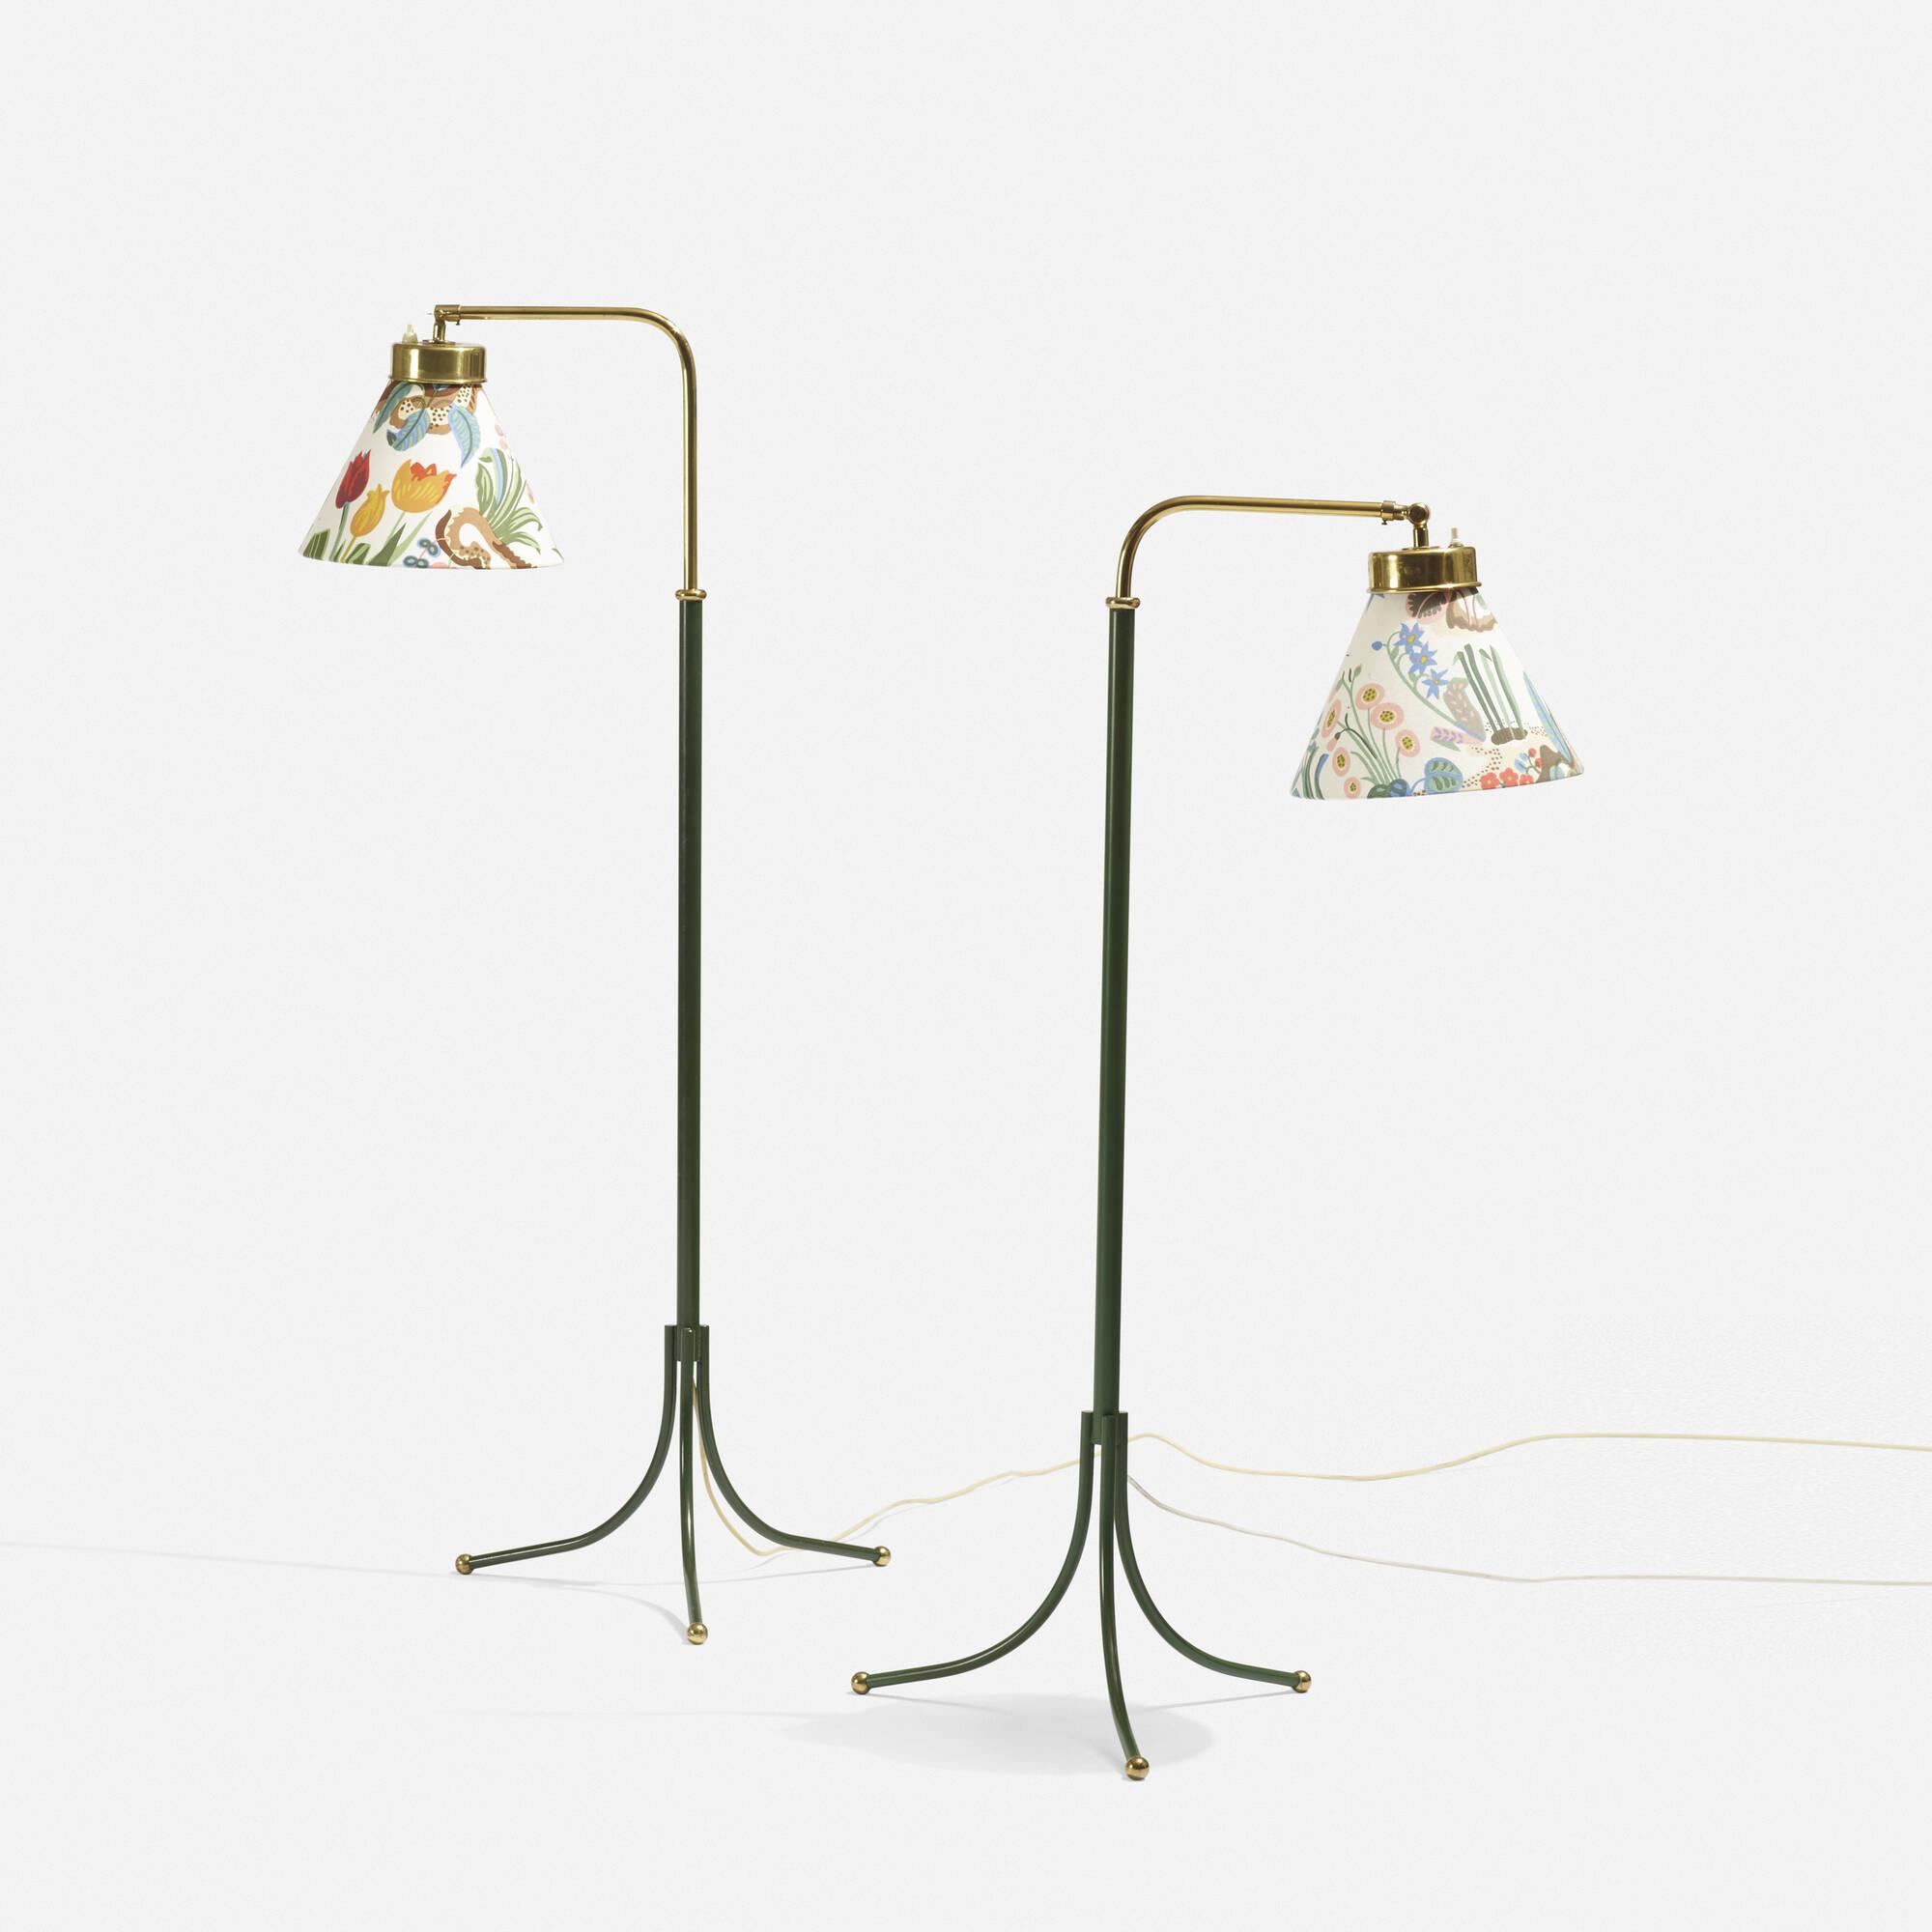 ... 220: Josef Frank / Adjustable Floor Lamps Model 1842, Pair (2 Of 3